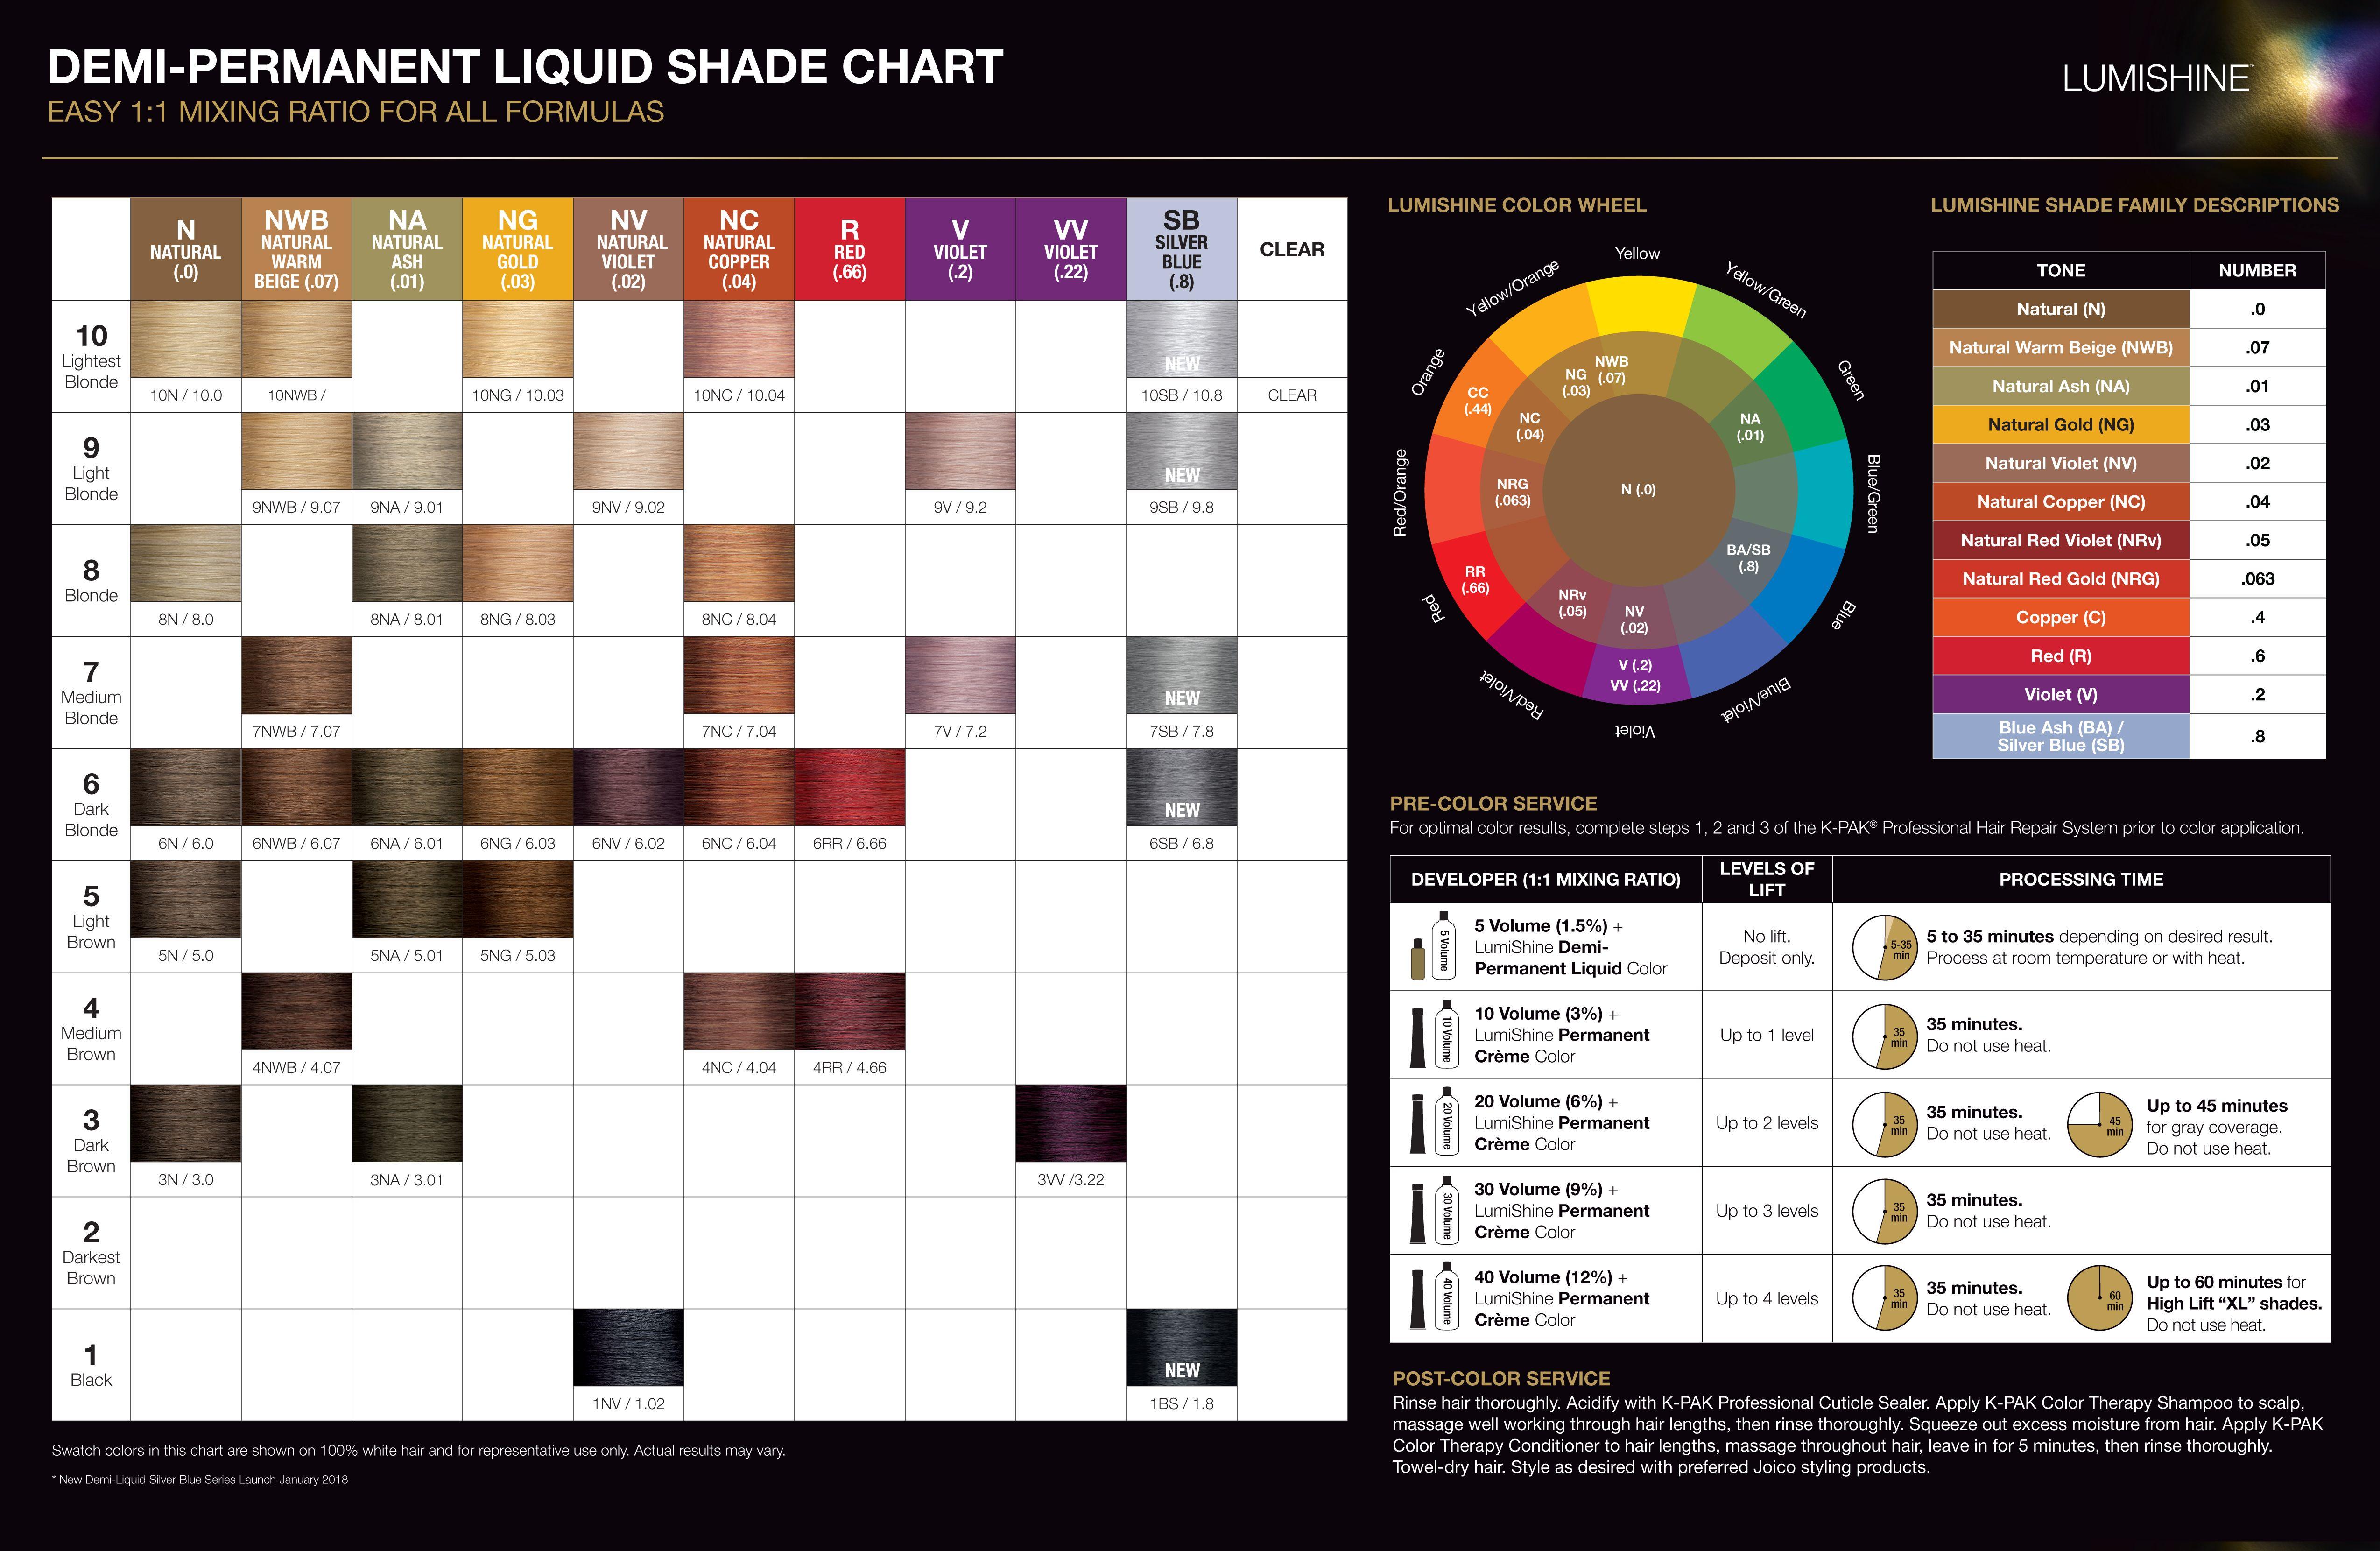 Joico lumishine color chart hairstyle inspirations 2018 joico lumishine demi permanent lquid shade chart 4 jan 2018 nvjuhfo Image collections